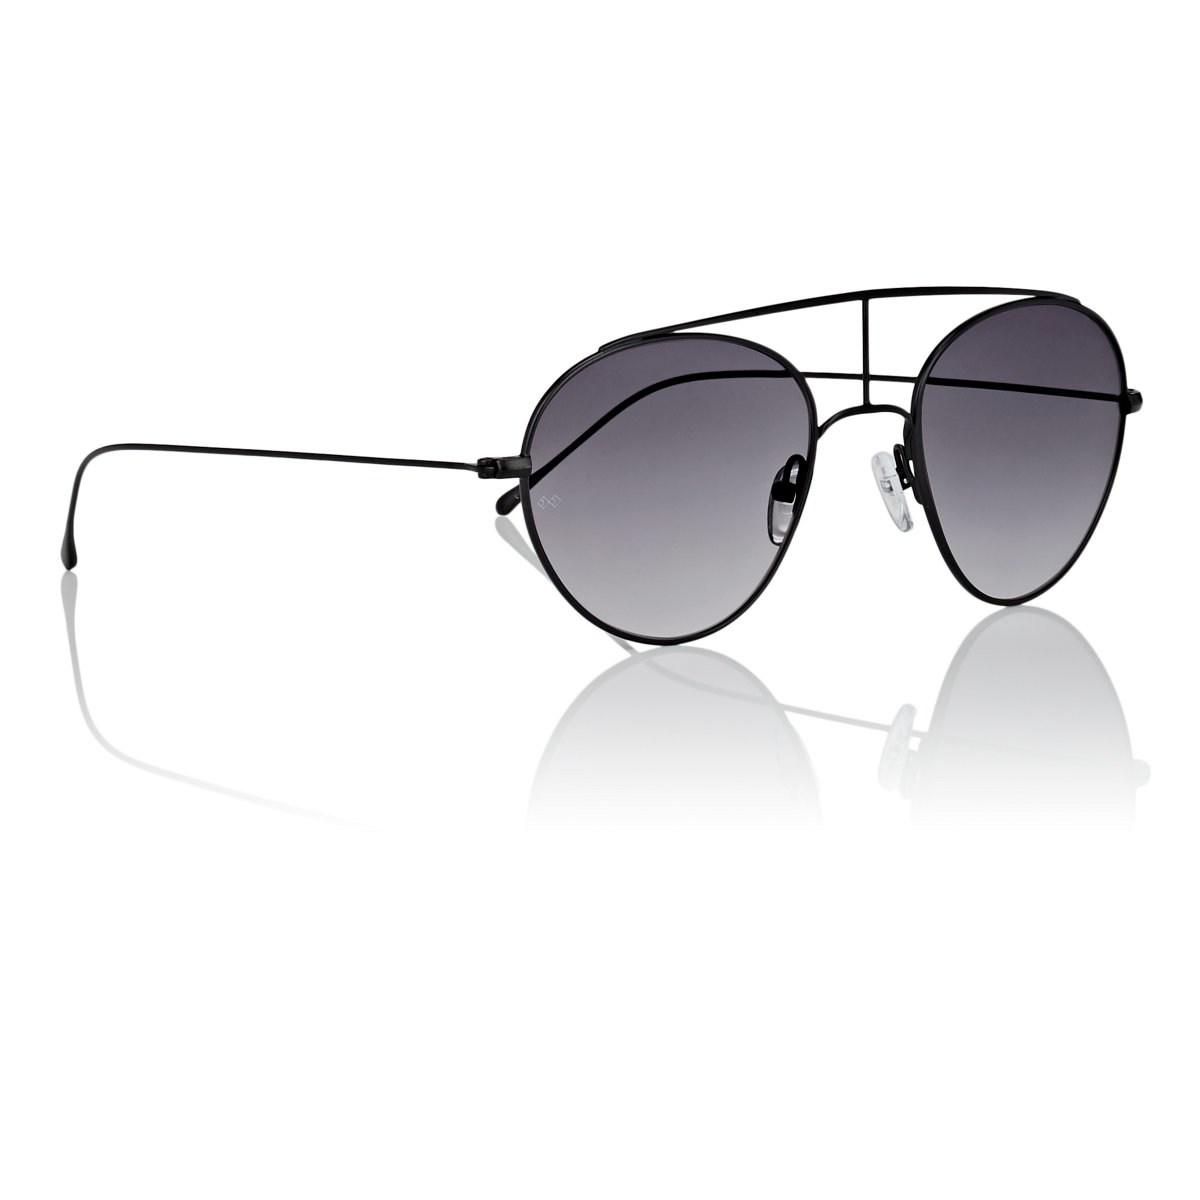 6b65023b30 Lyst - Smoke X Mirrors Geo Vi Sunglasses in Gray for Men